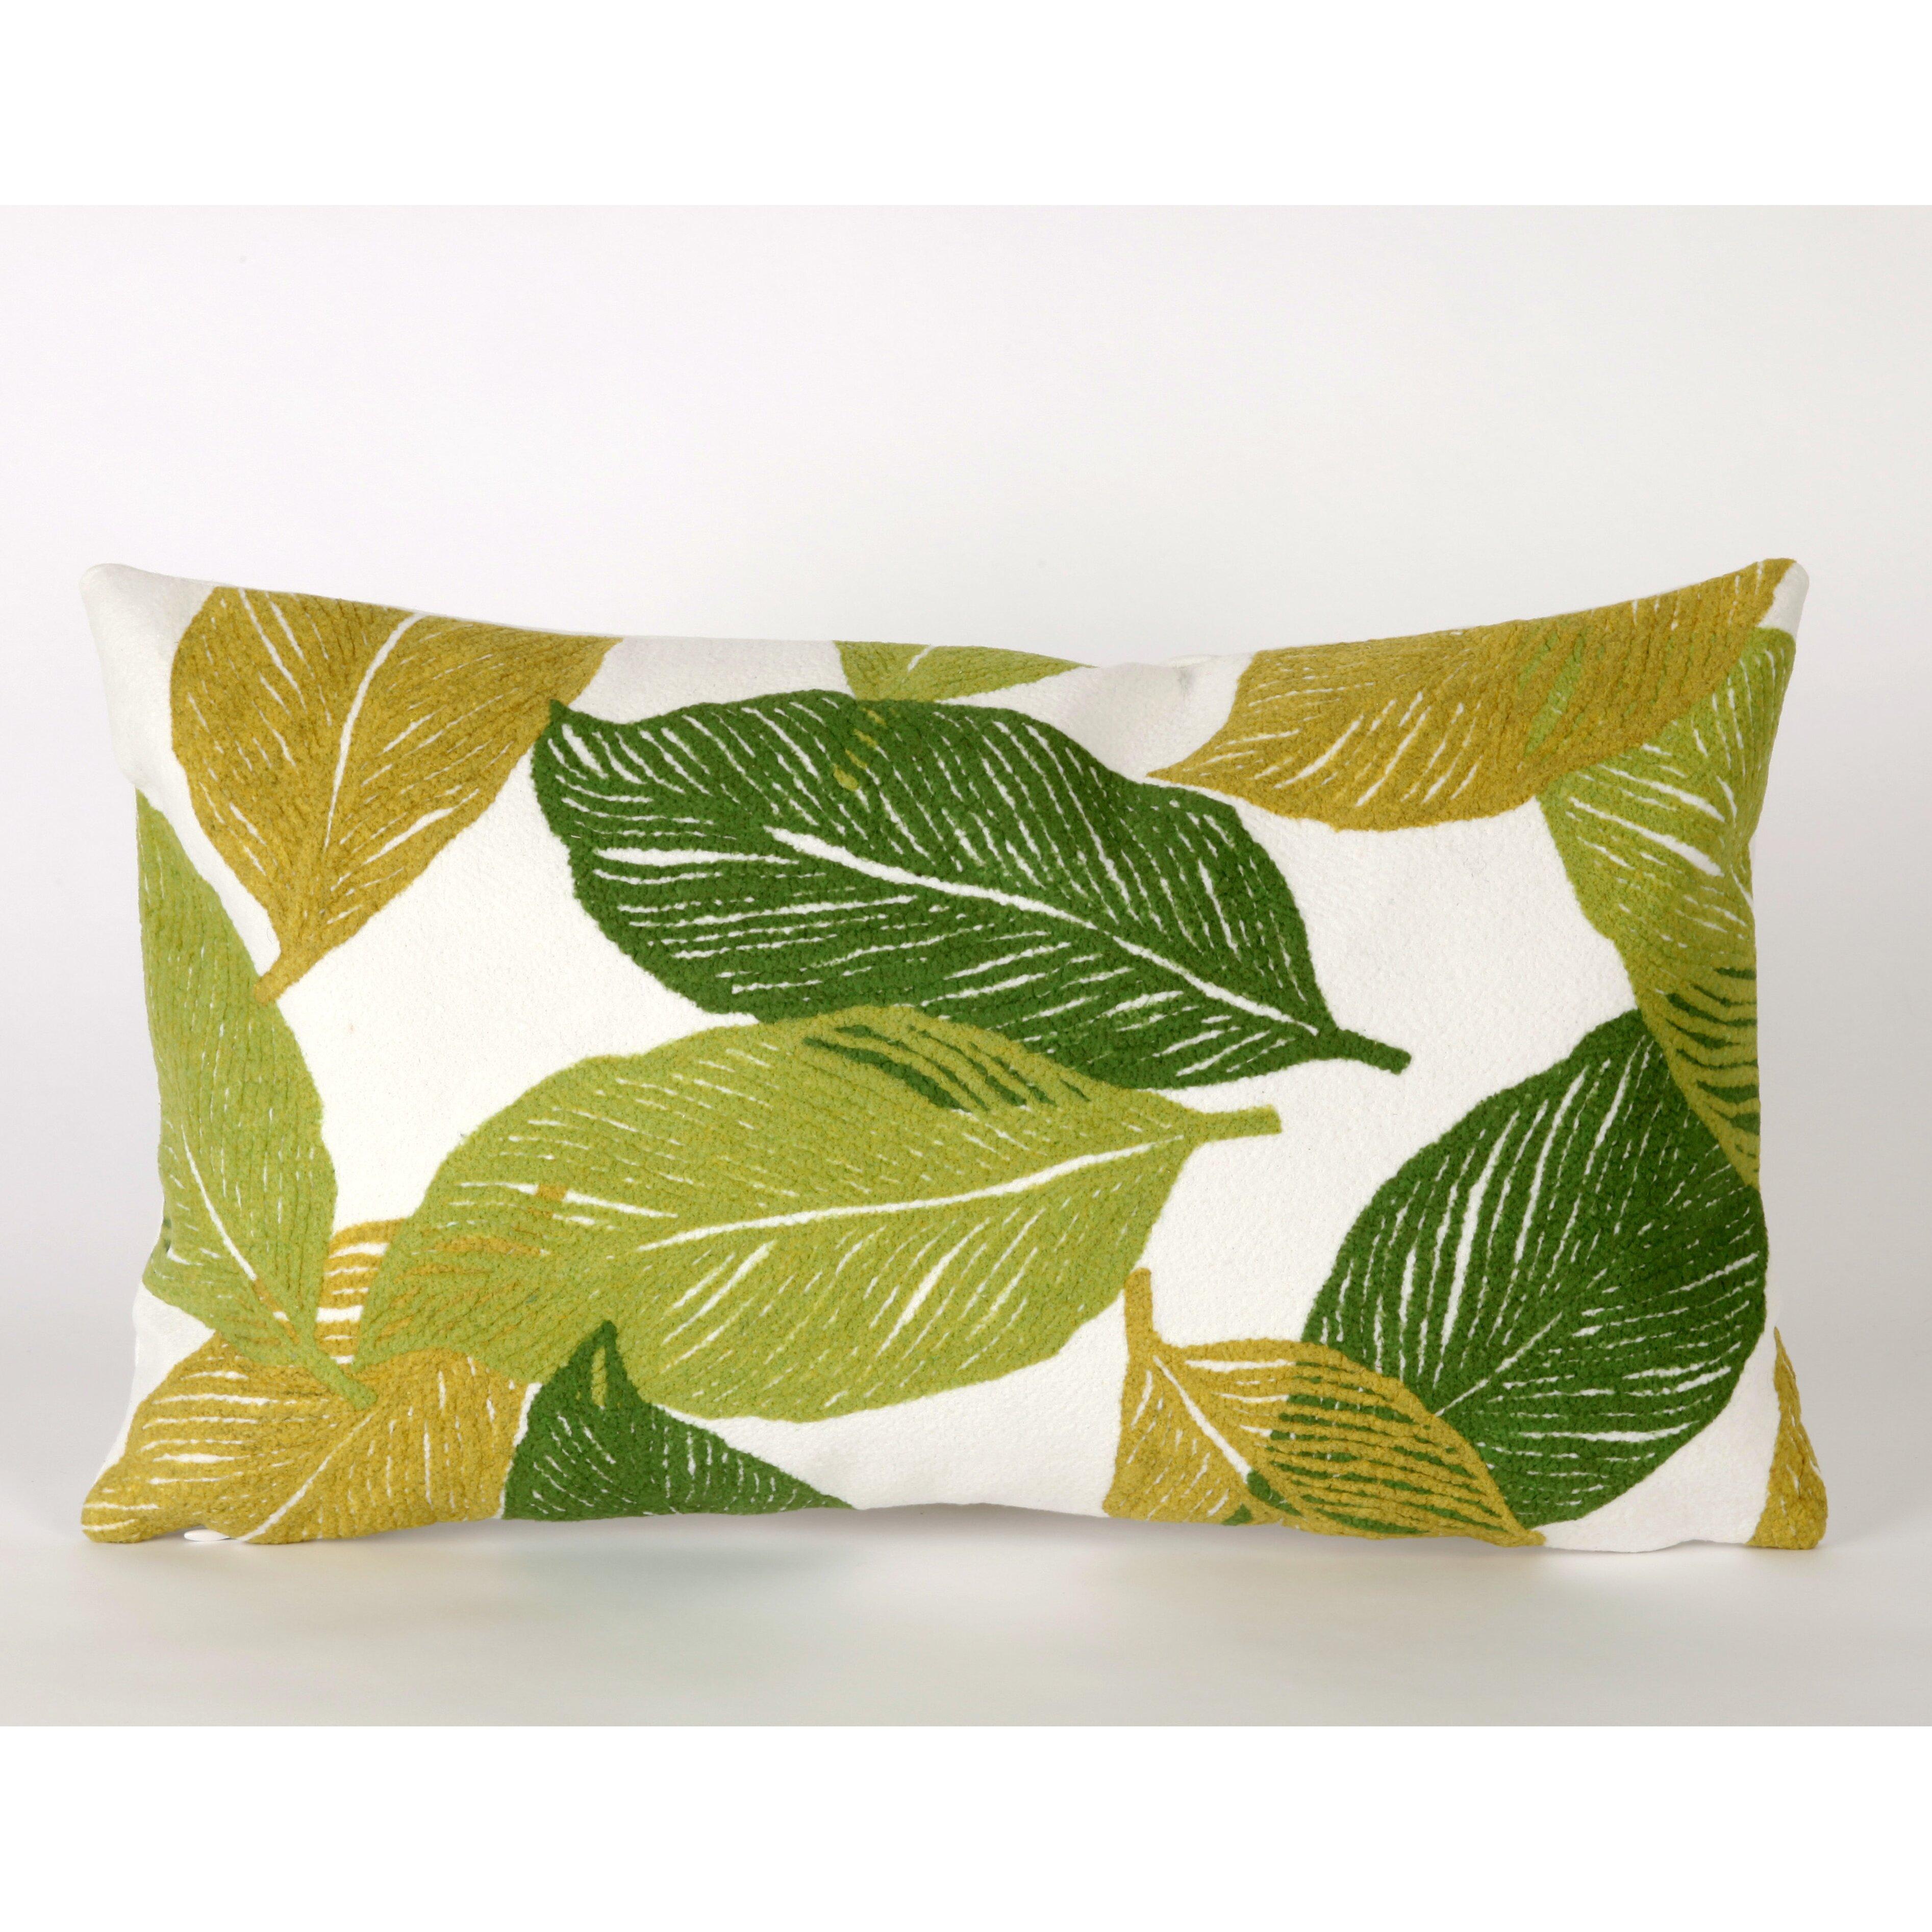 Liora Manne Mystic Leaf Indoor Outdoor Lumbar Pillow